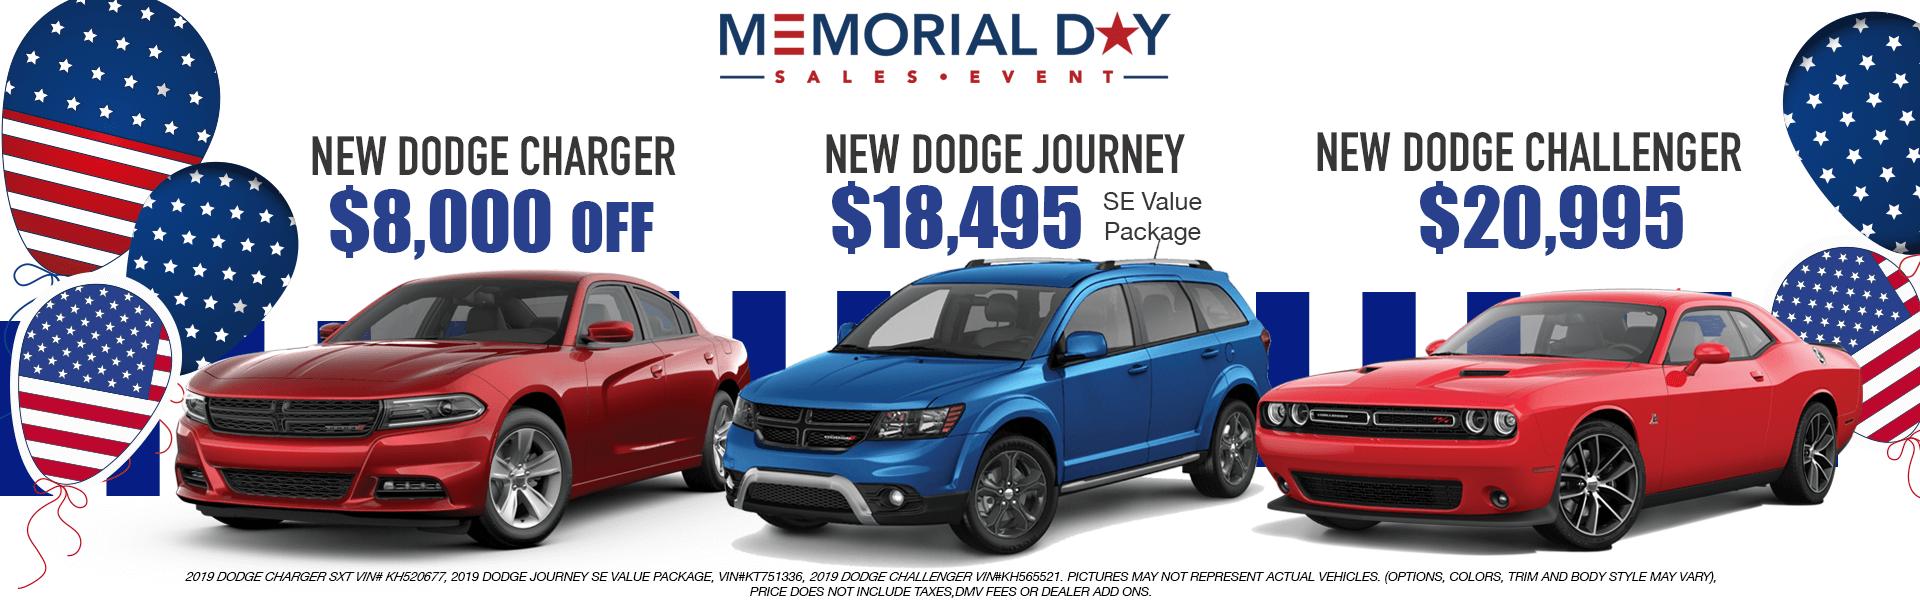 Dodge: Charger,Journey,Challenger